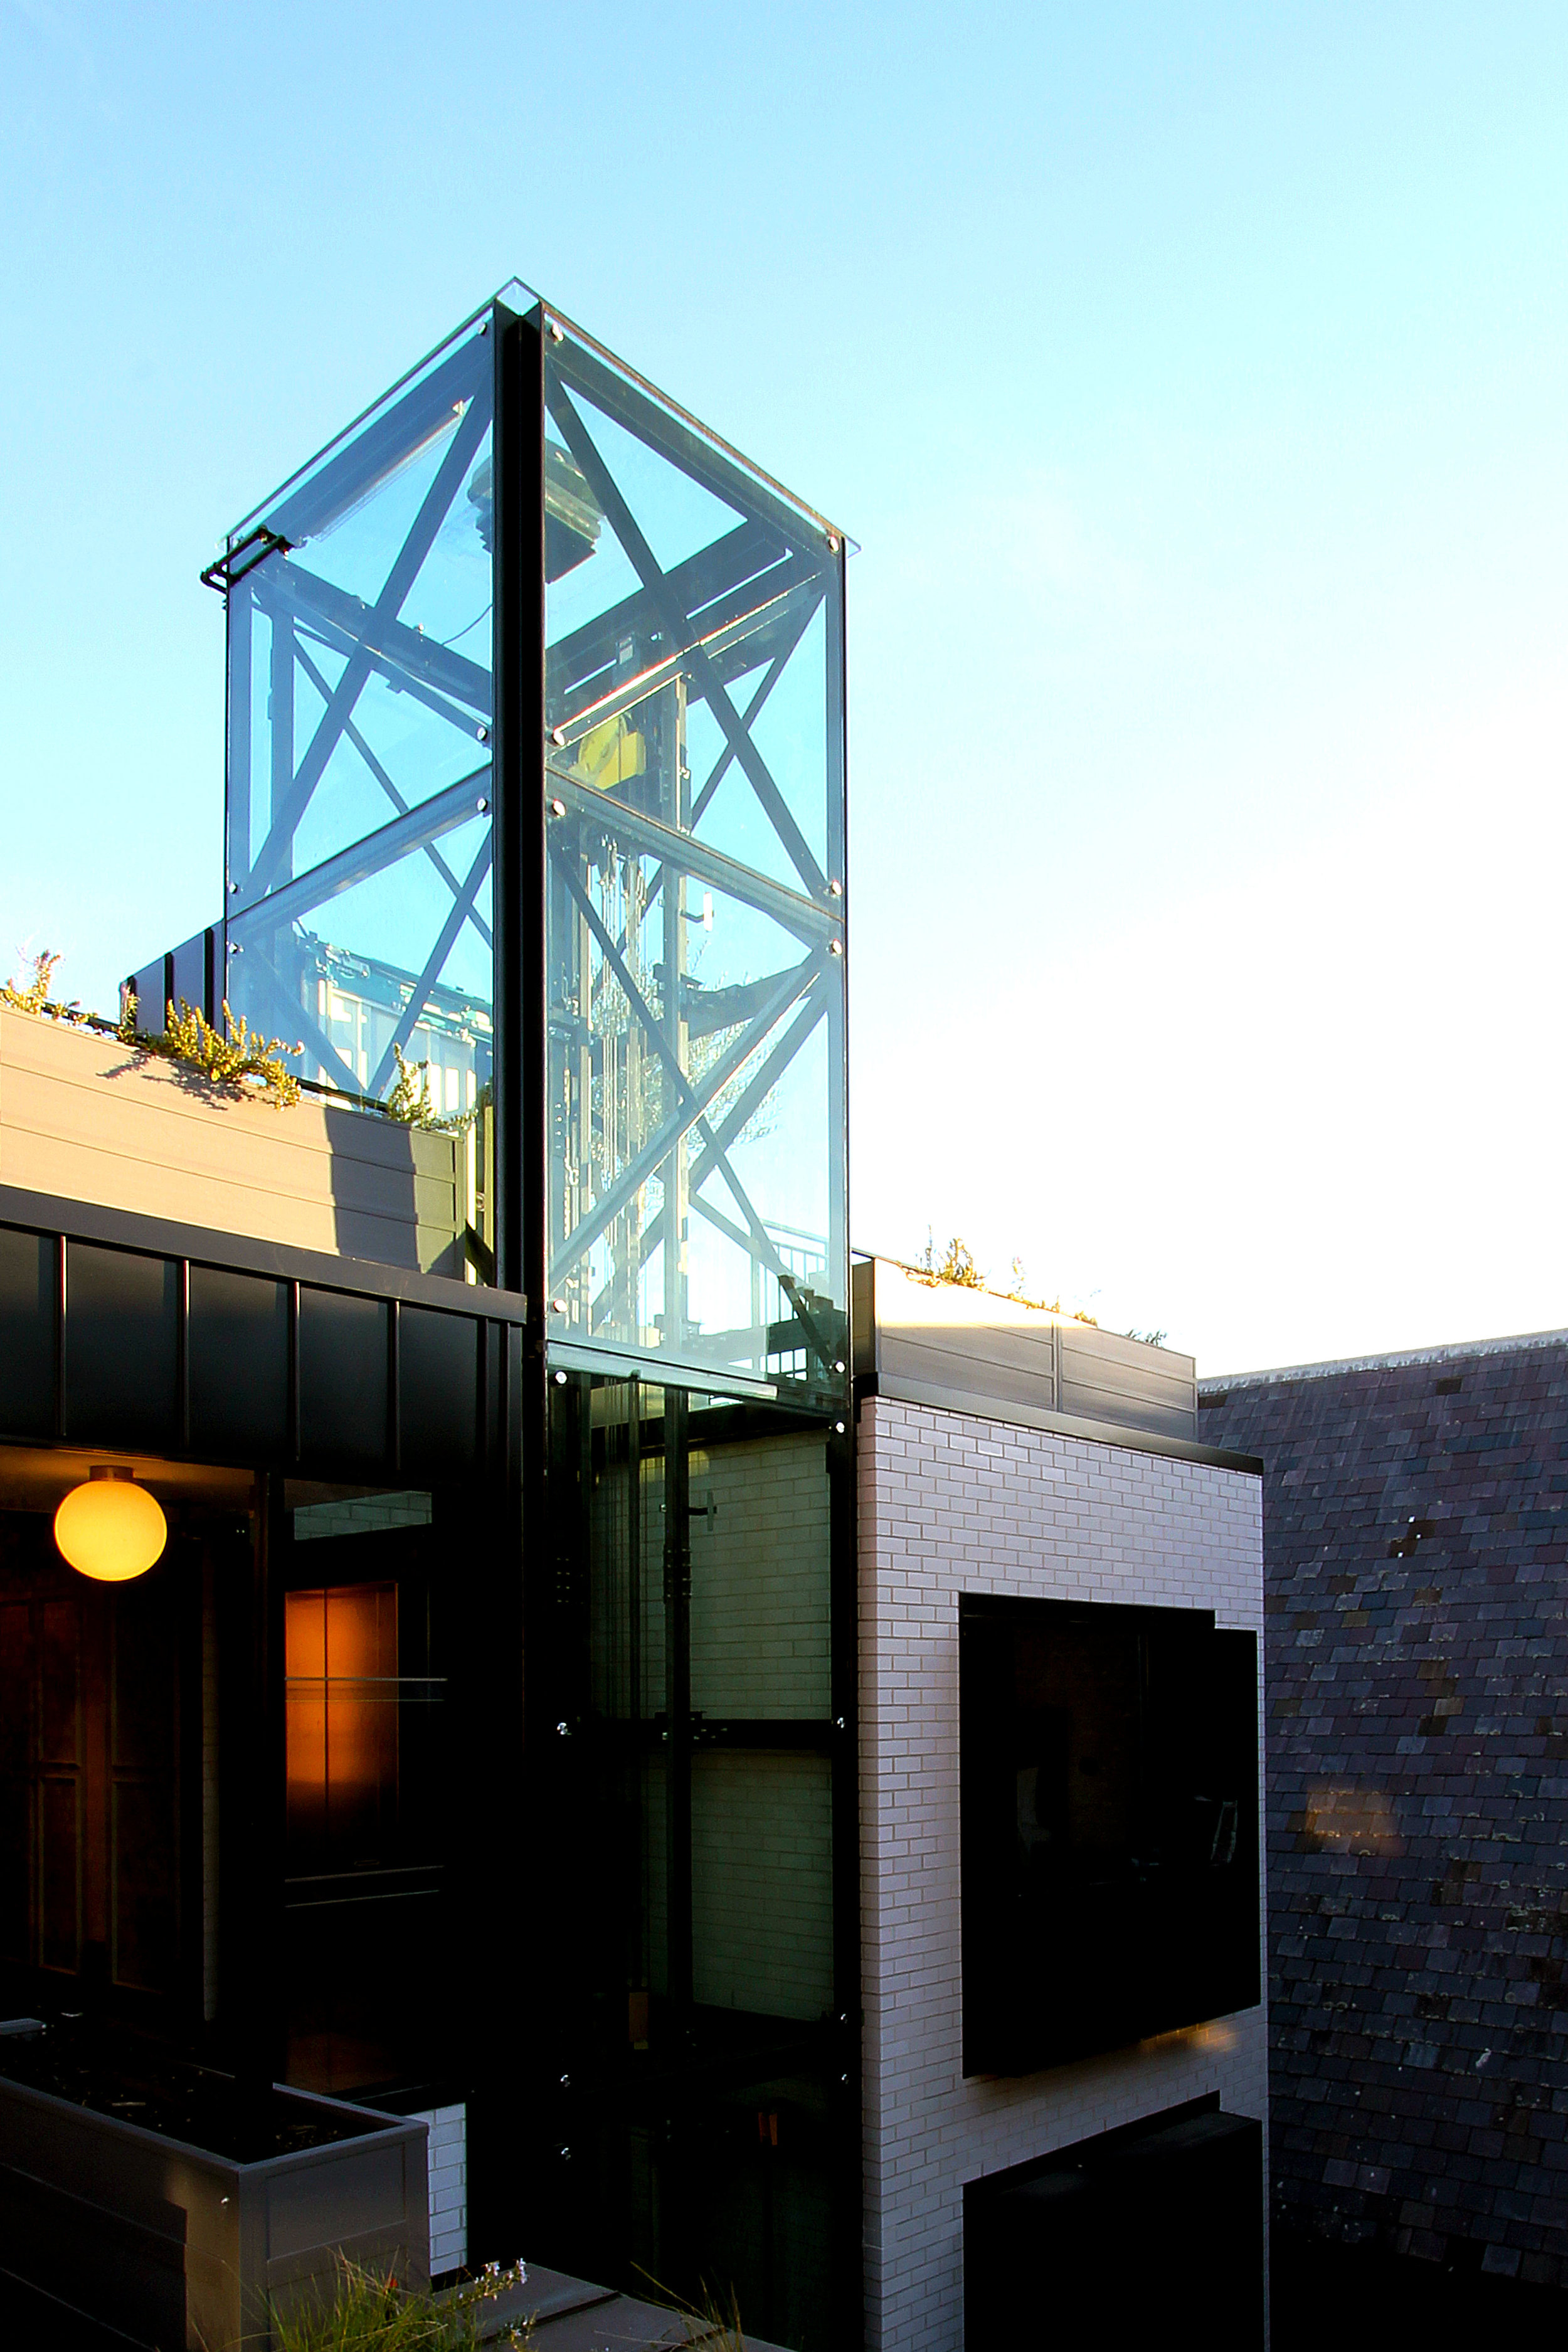 TYA Photography | Little Albion Guest House | Glass Lift Tower | Winter | Sunset 01 | A6349.jpg